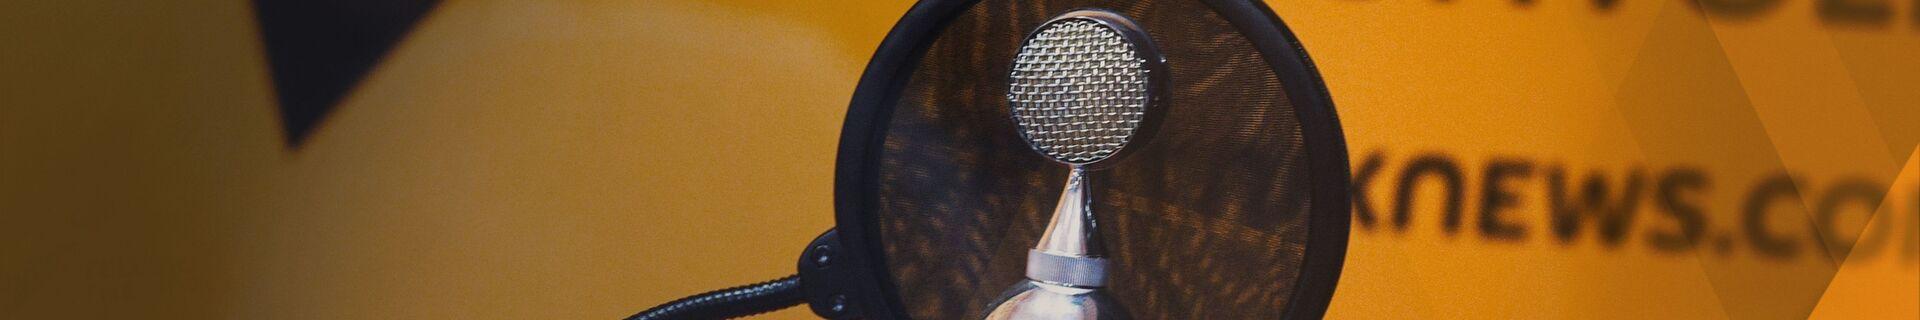 Микрофон  - Sputnik Абхазия, 1920